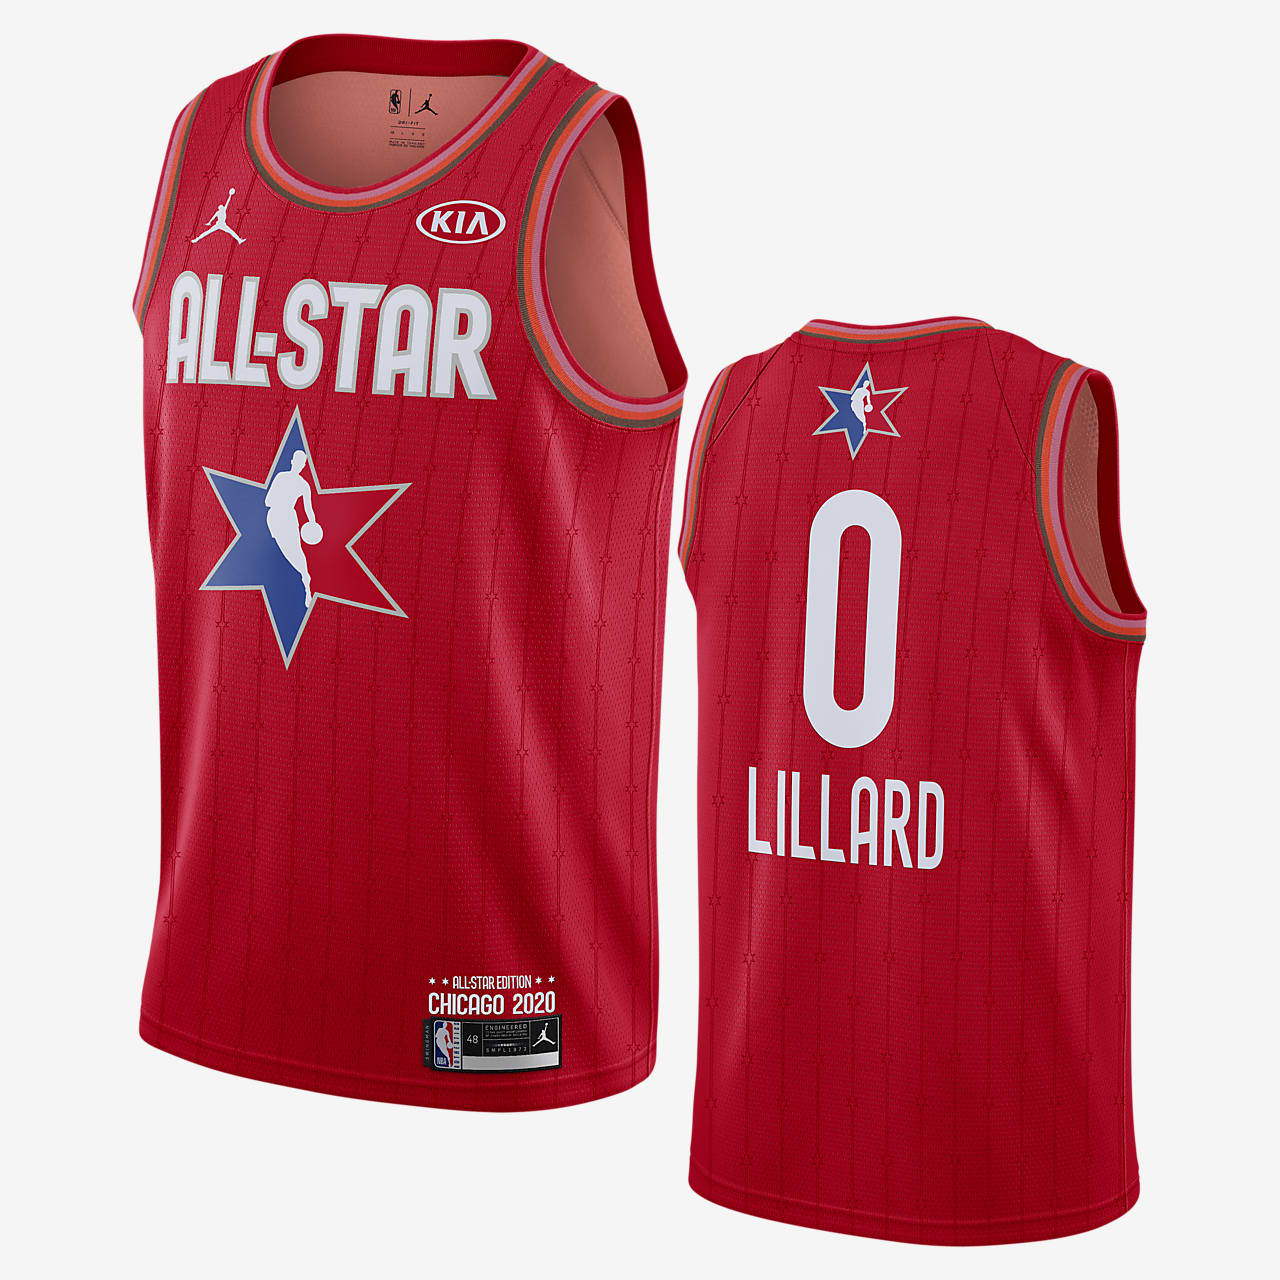 Damian Lillard All-Star Jordan NBA Swingman Jersey